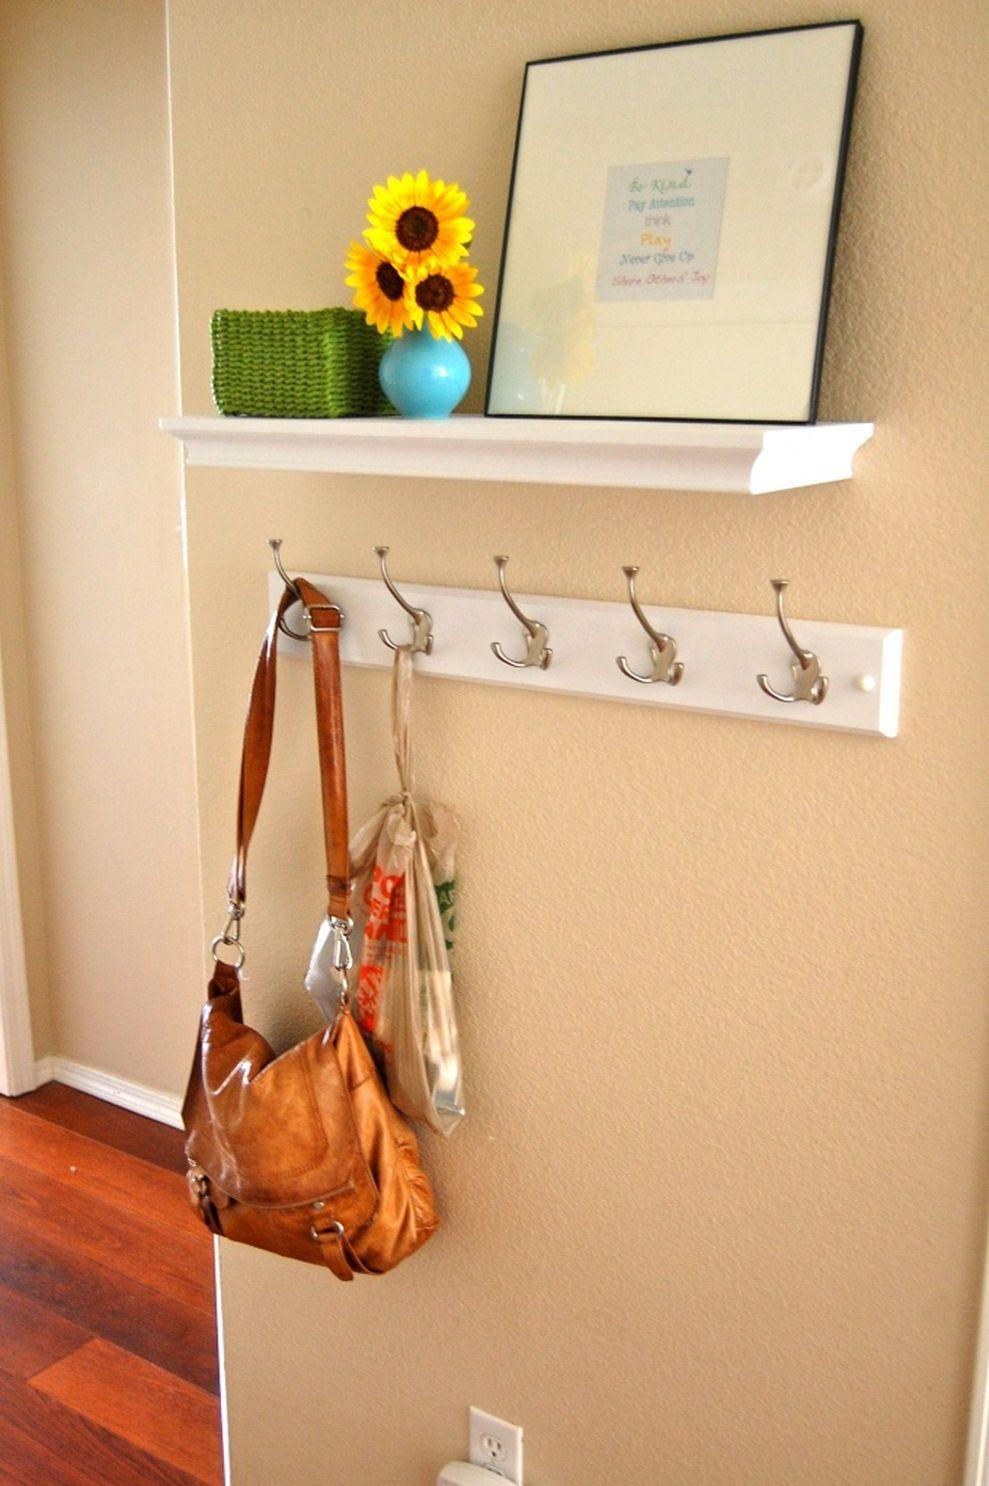 28 Easy Ideas for DIY Coat Rack Shelf | Diy coat rack, Coat rack ...